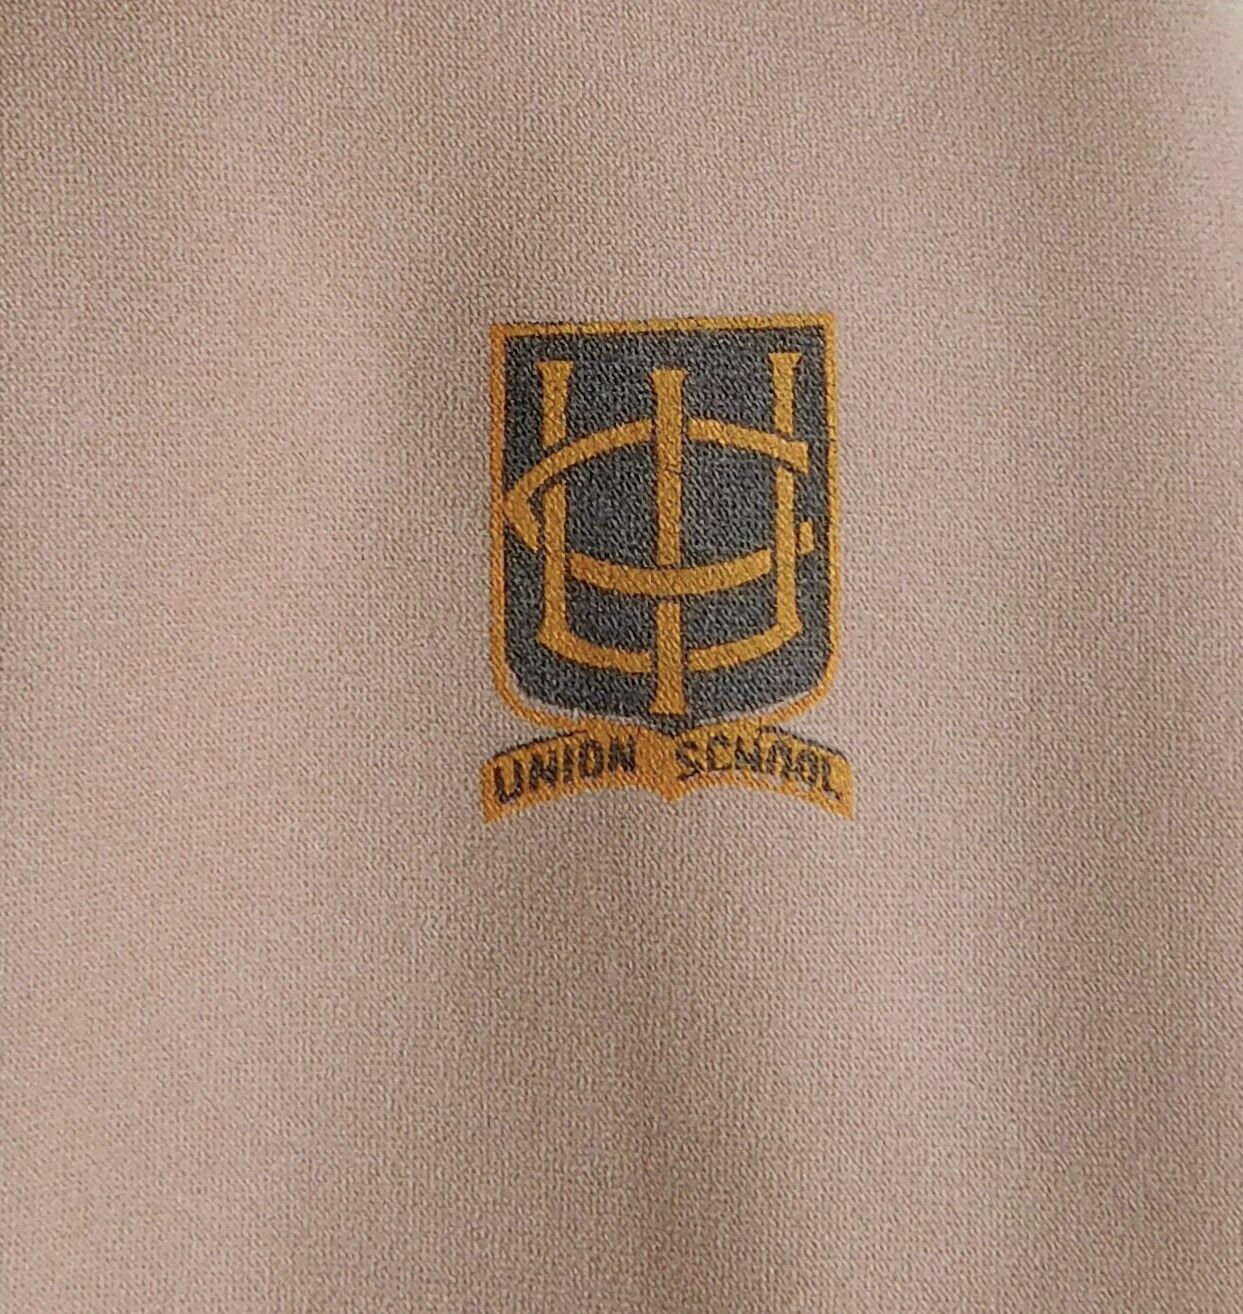 Union School tie CIU Club and Institute Union organisation member vintage